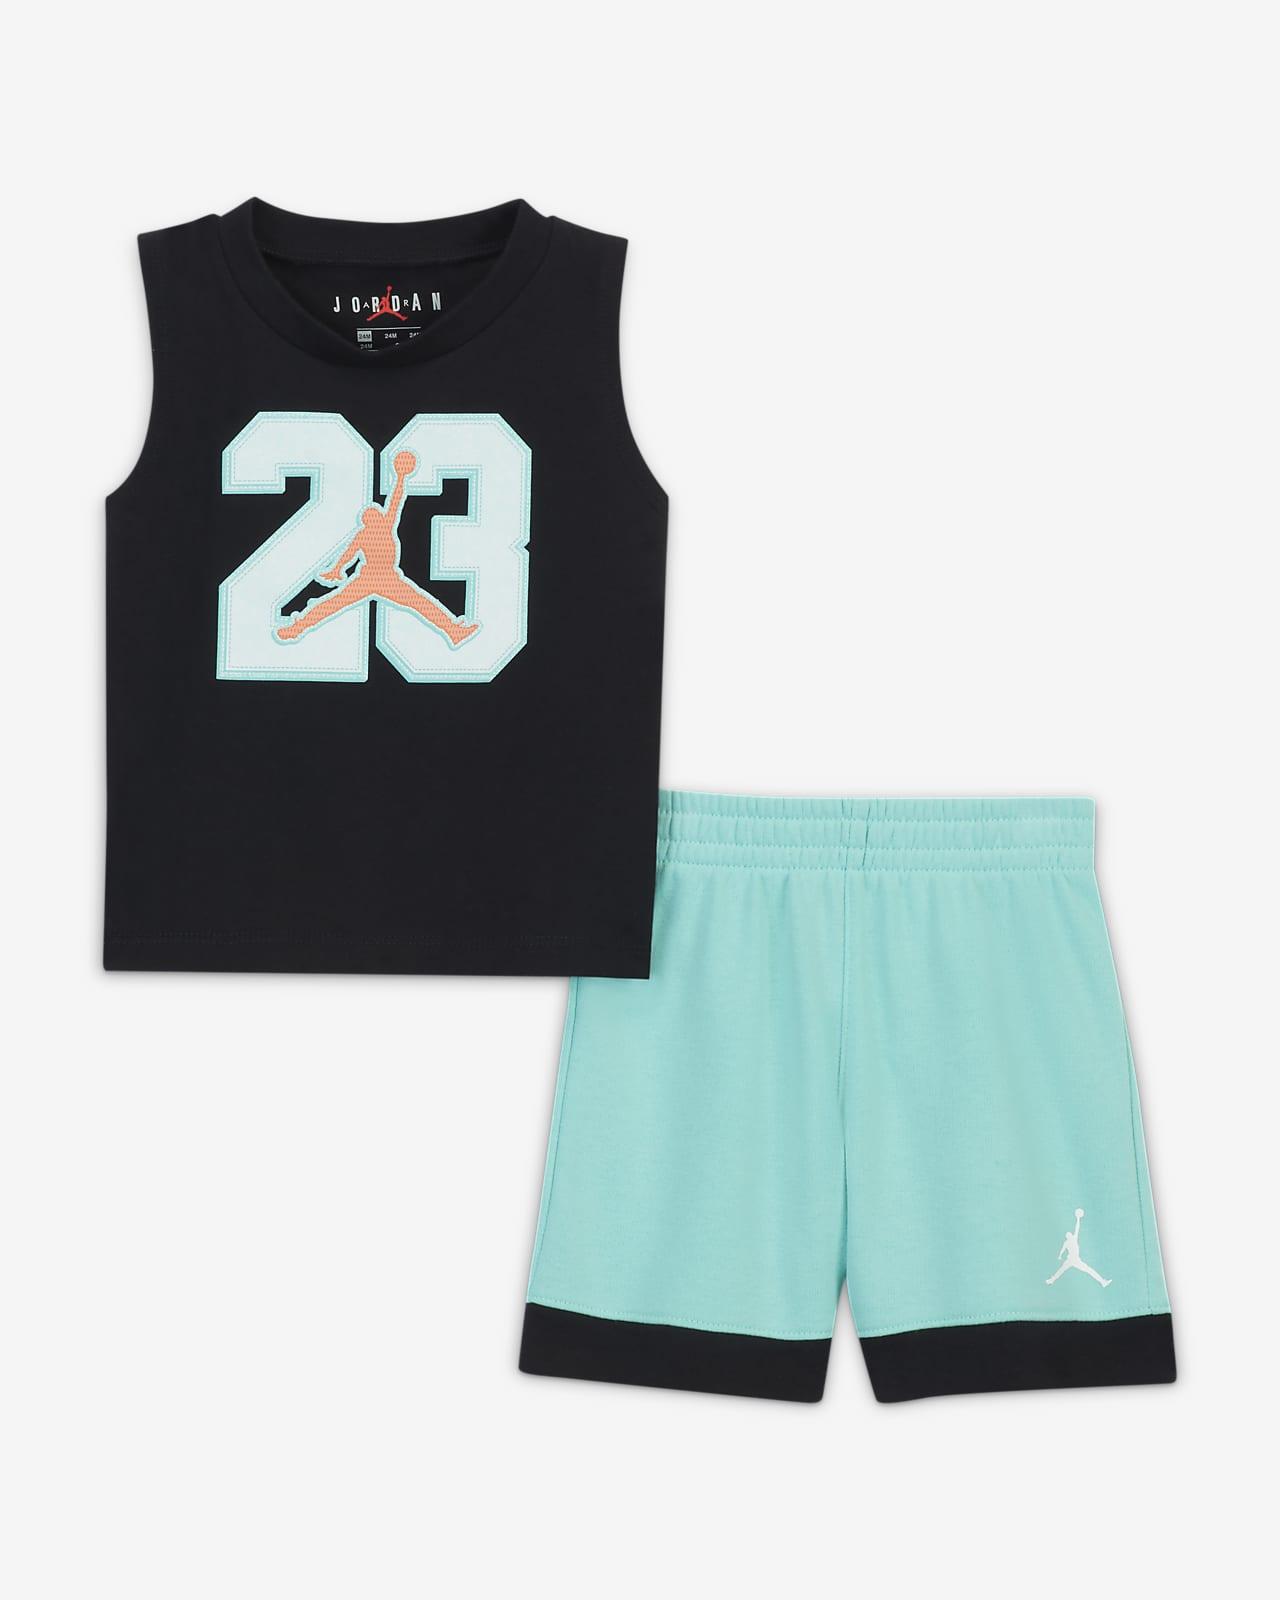 Jordan Baby (12-24M) Tank Top and Shorts Set